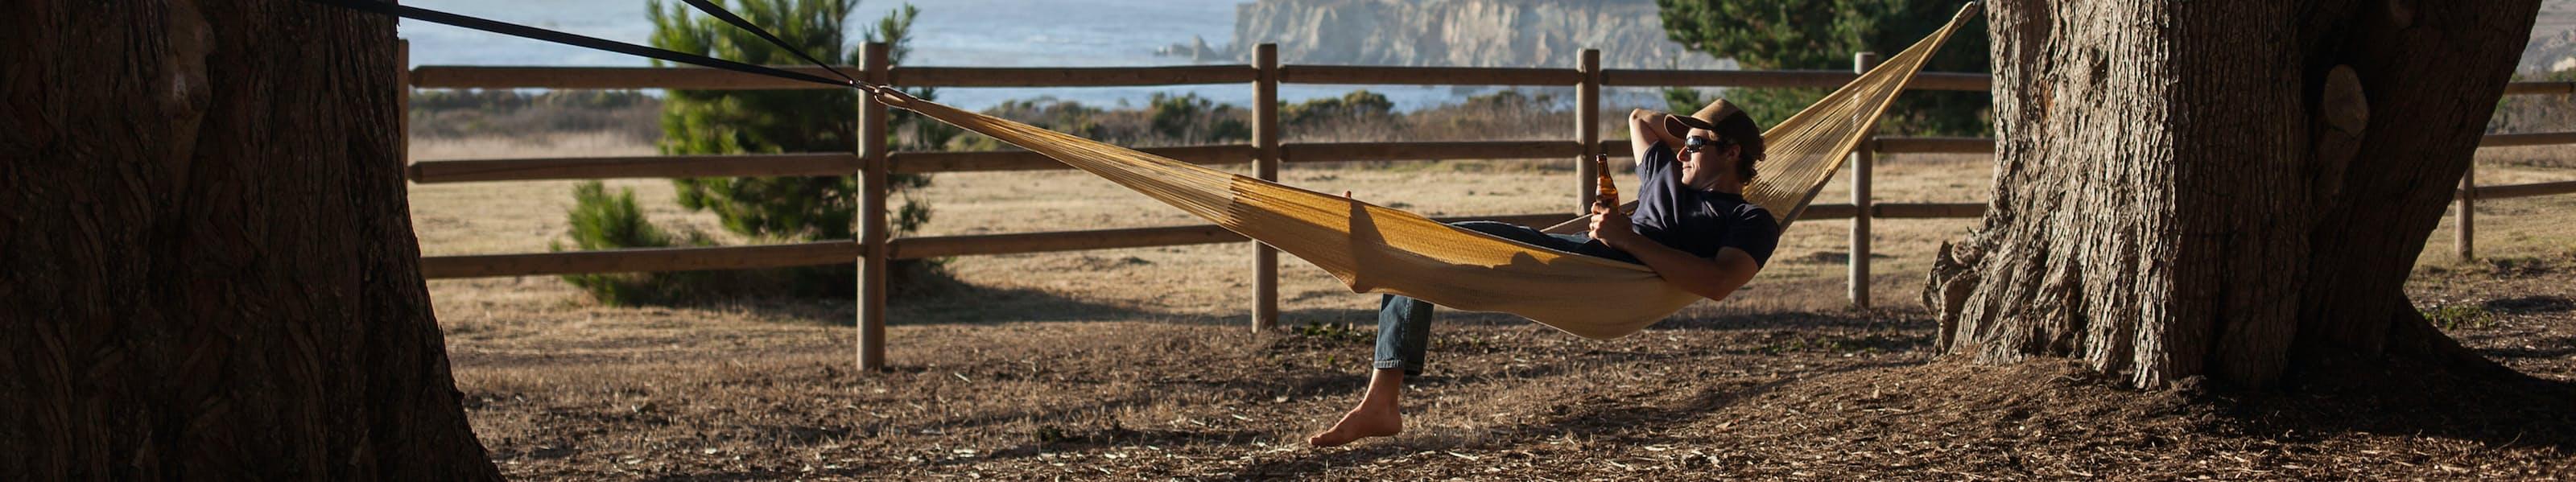 Big sur hammock   5   lifestyle